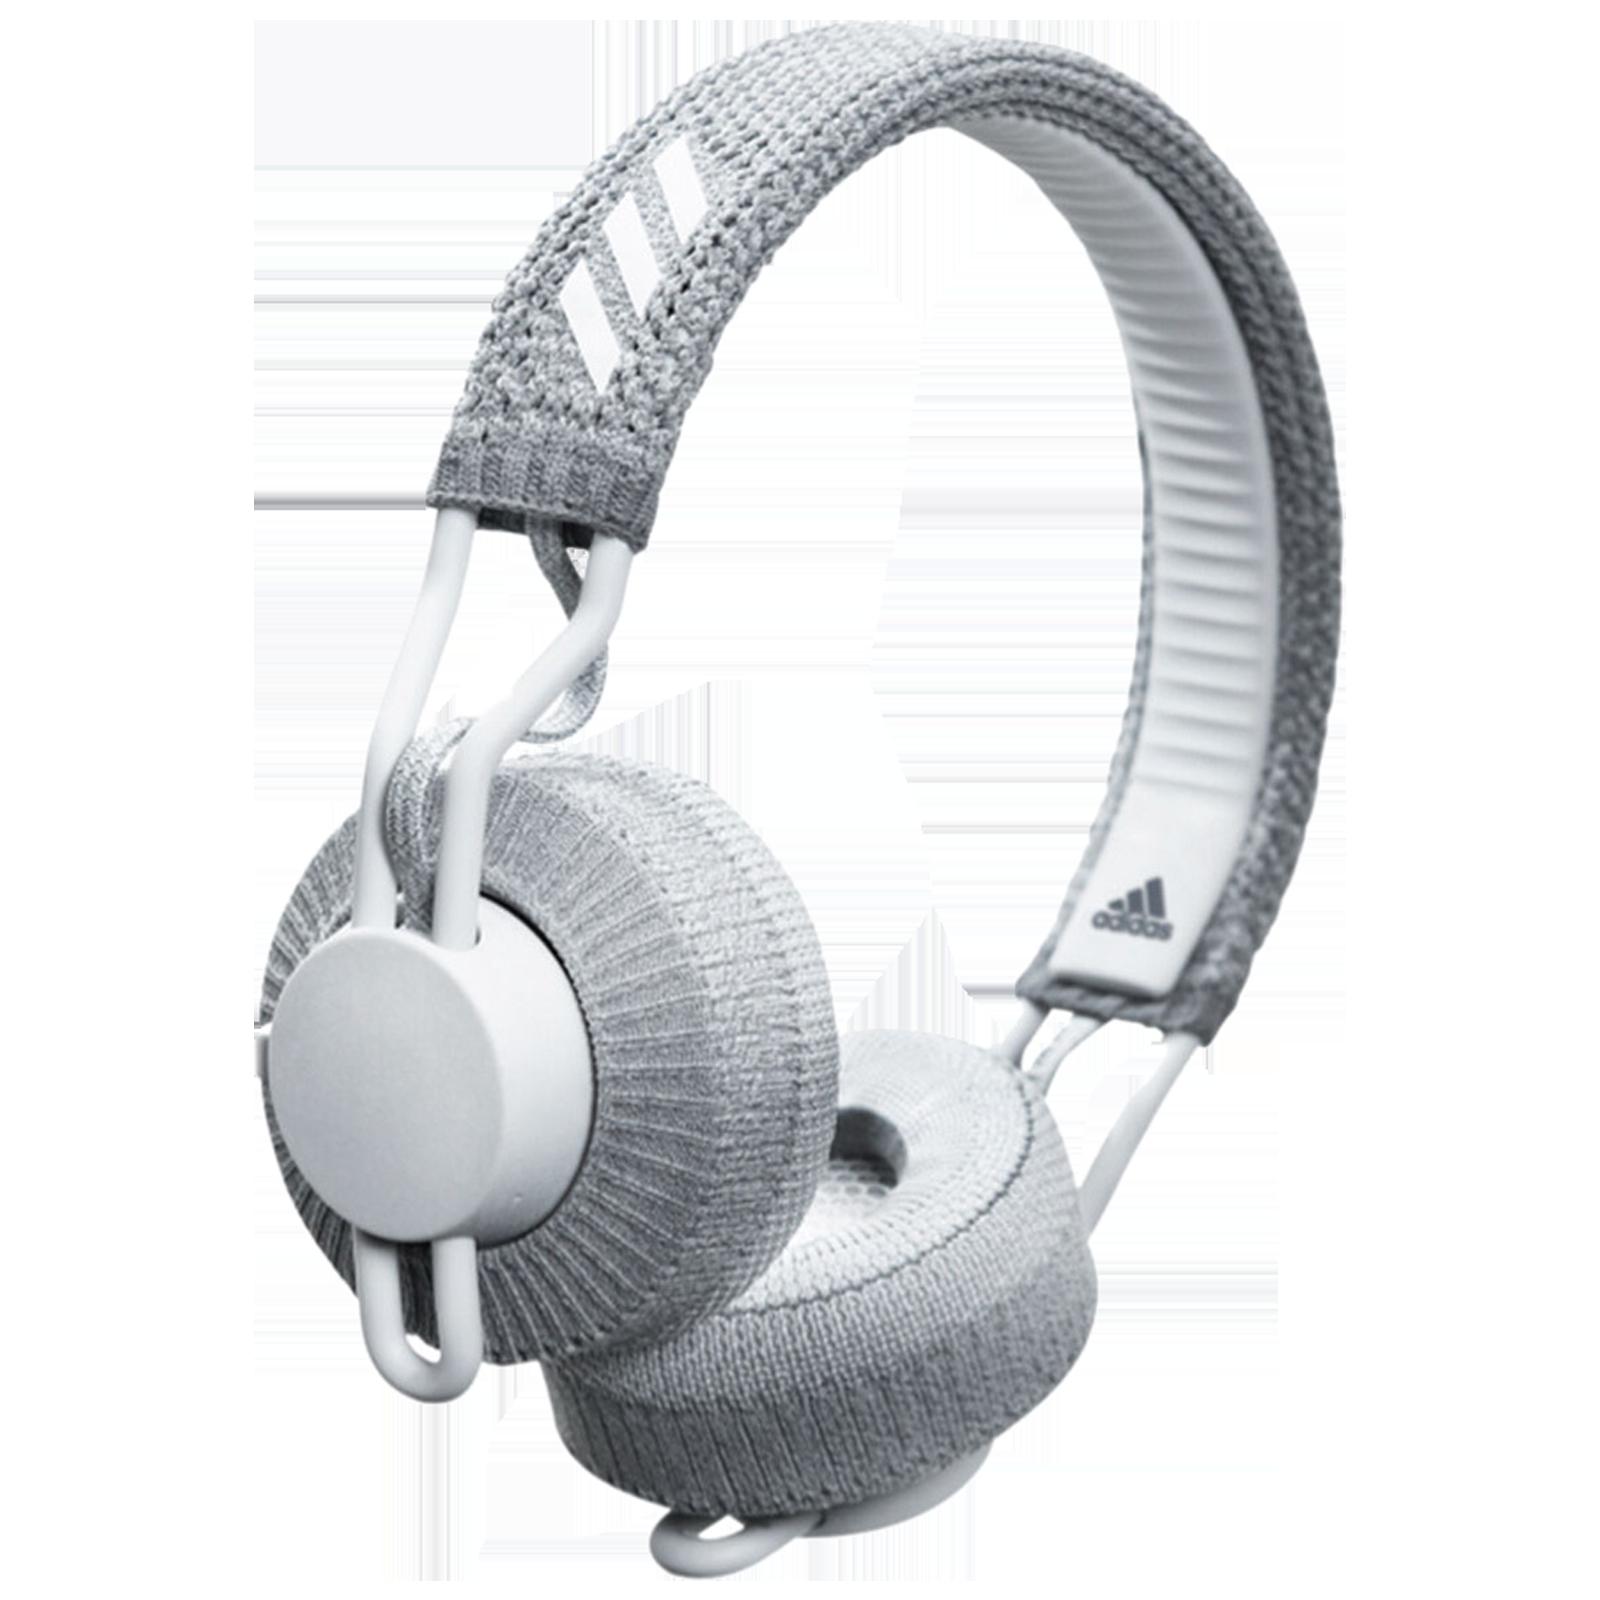 Adidas RPT-01 On-Ear Wireless Headphone with Mic (Bluetooth 5.0, Water Resistant, AD-RPT01-LGRY, Light Grey)_1